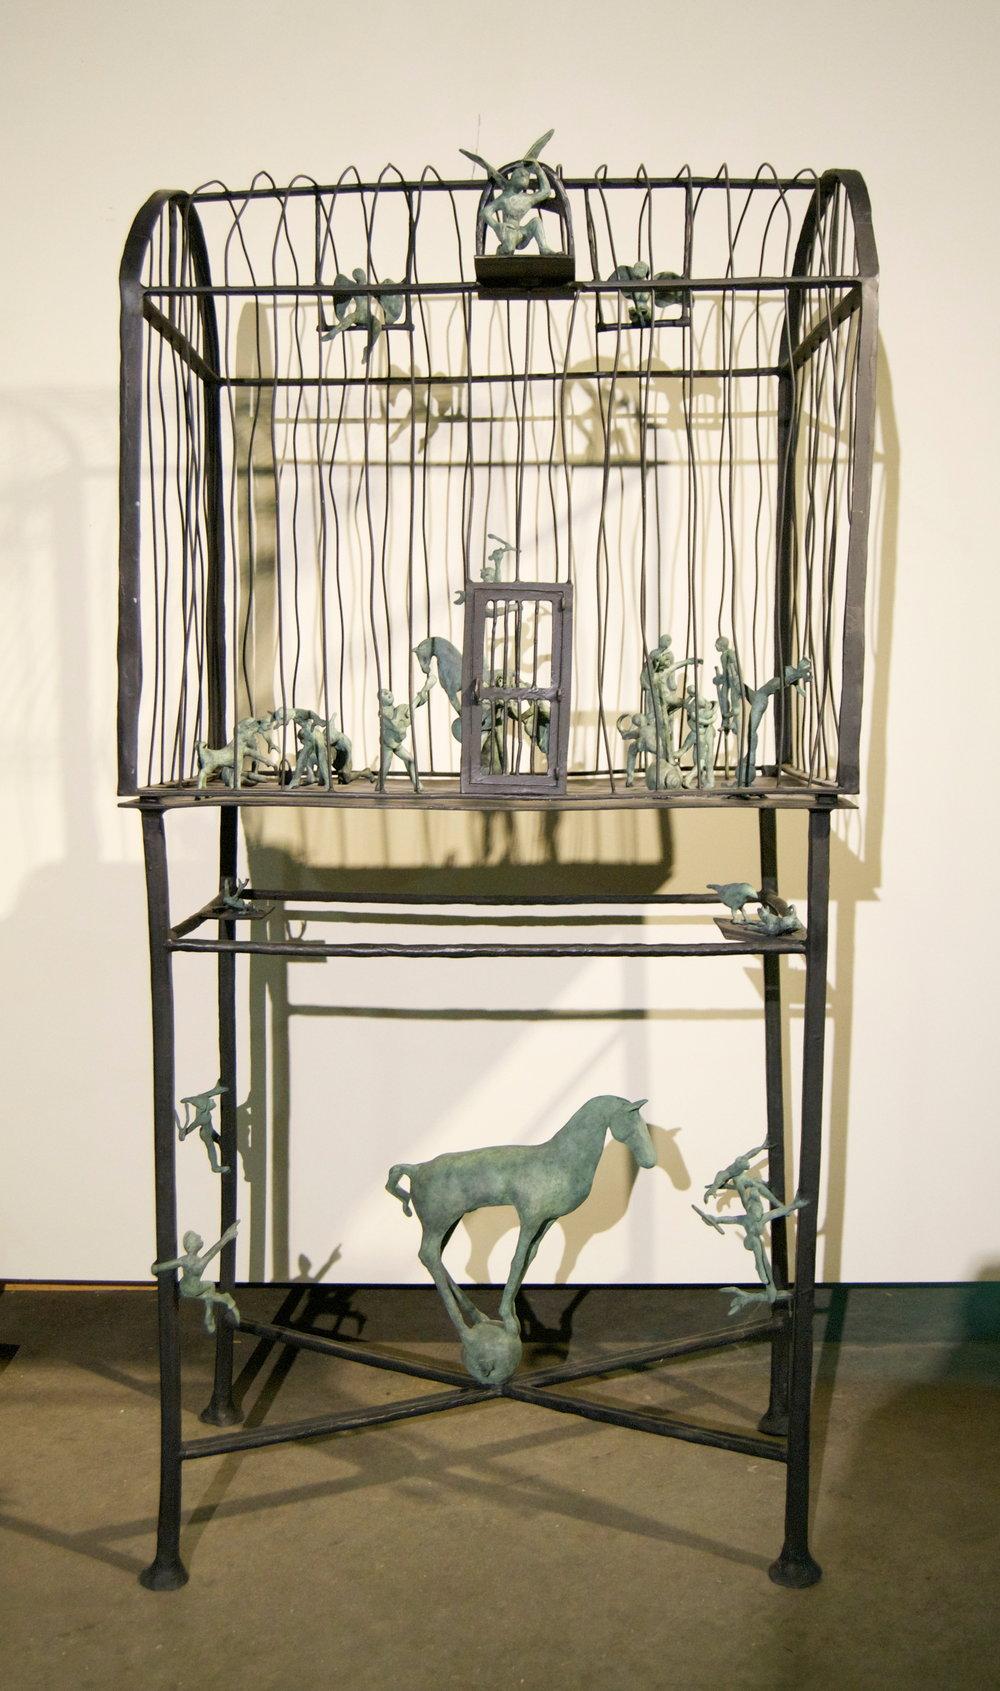 O Caçador de Sonhos #5   Bronze, unique 55 x 30 x 18 inches